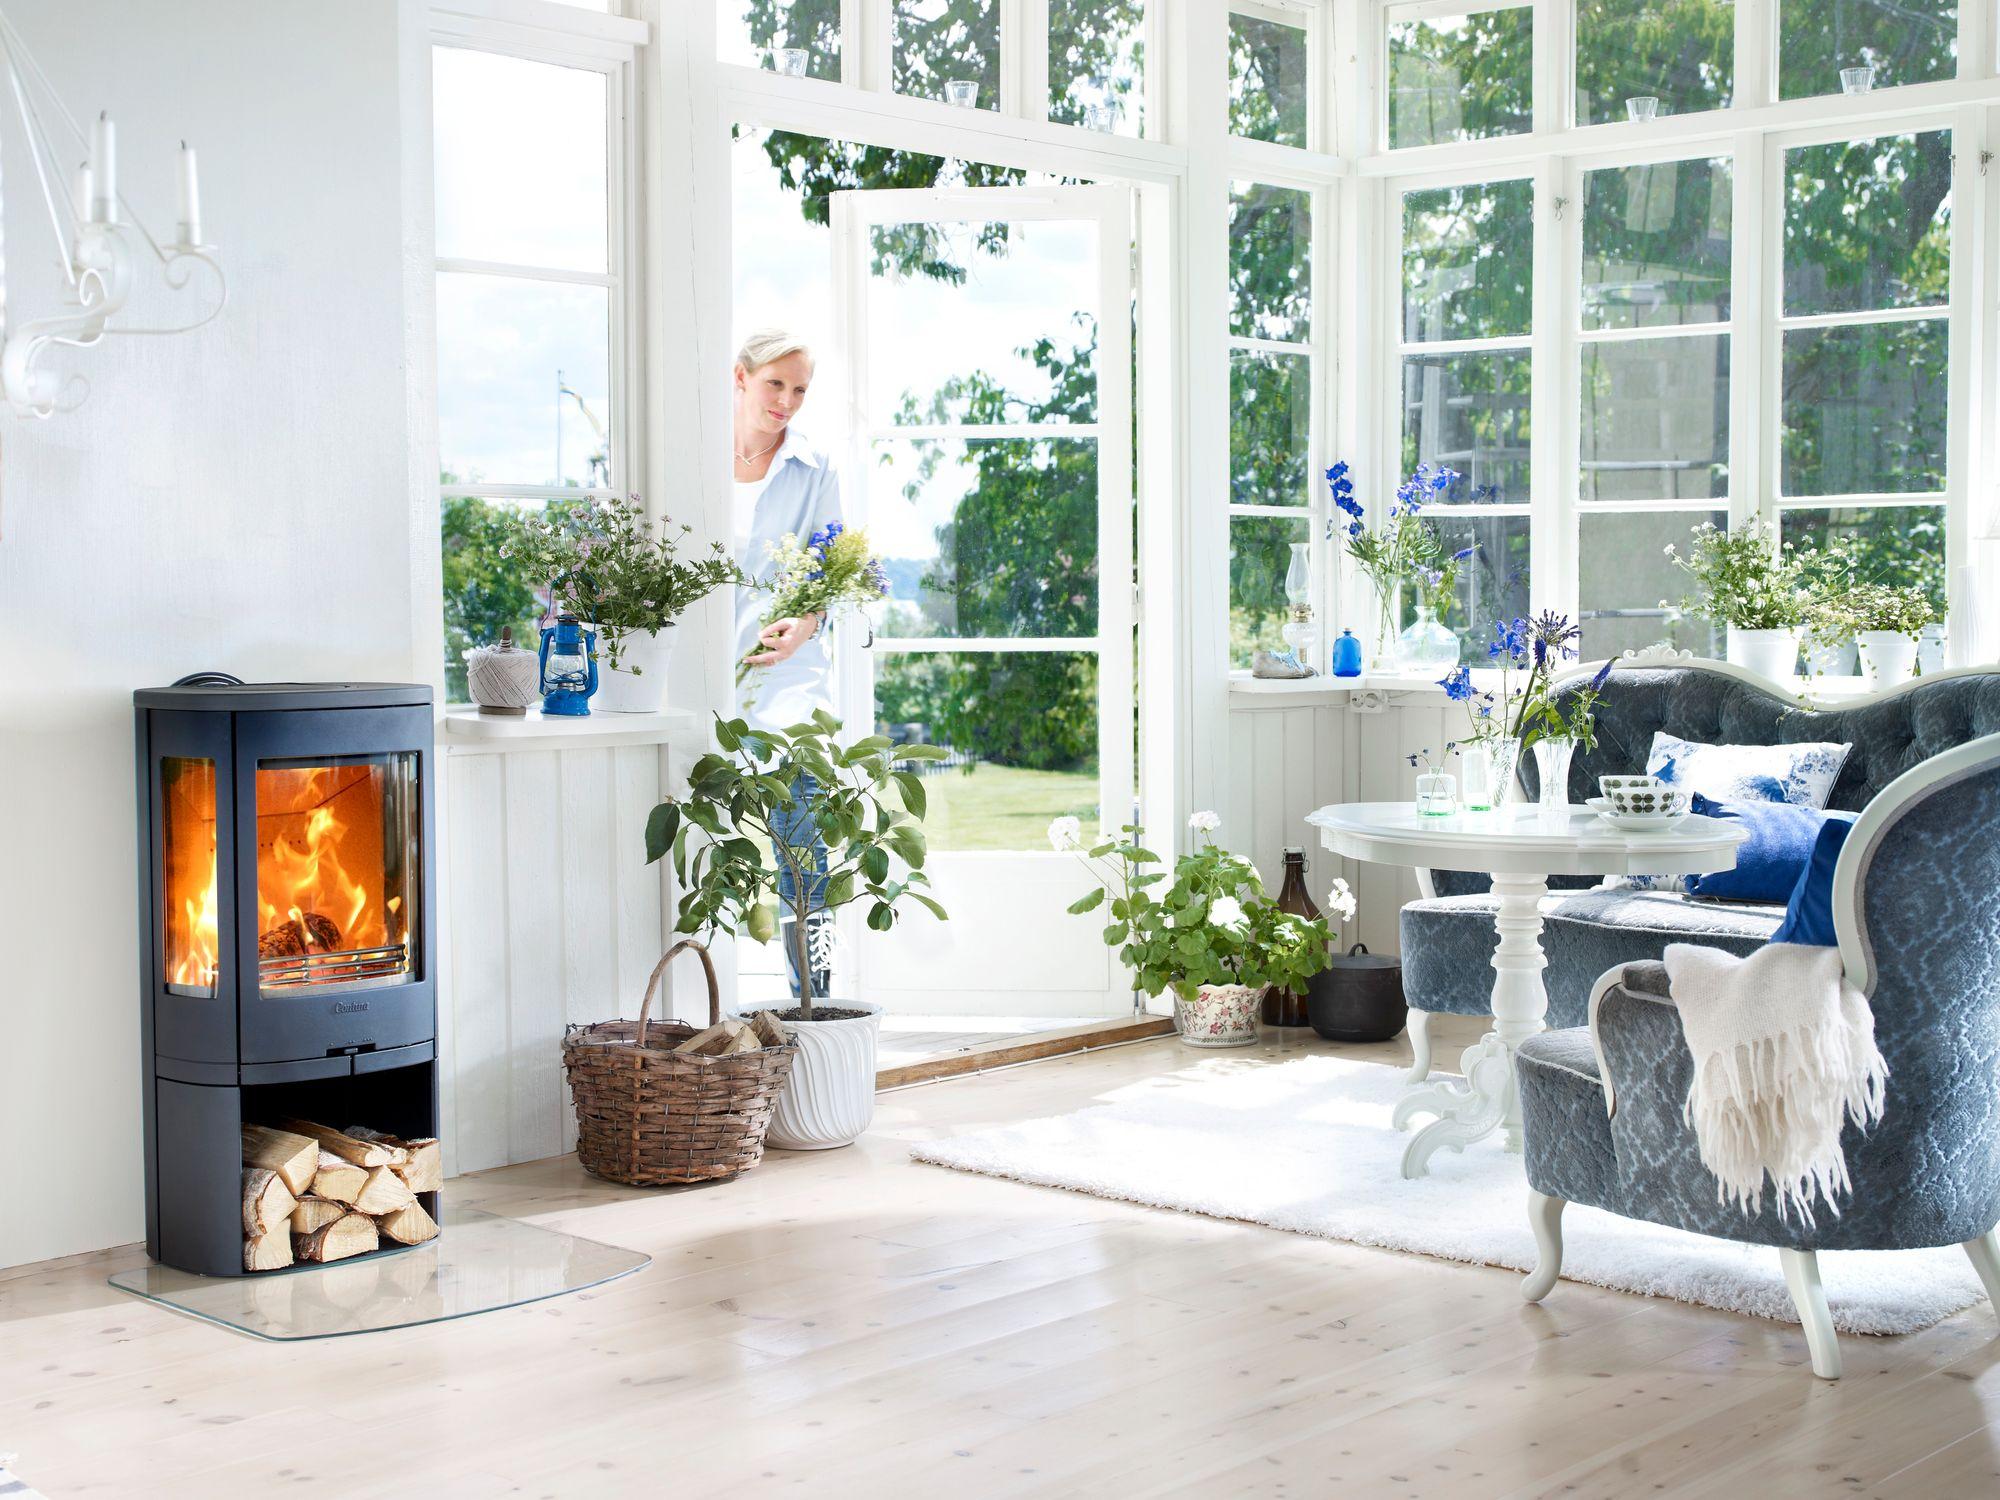 Contura 850 Woodburning Stove